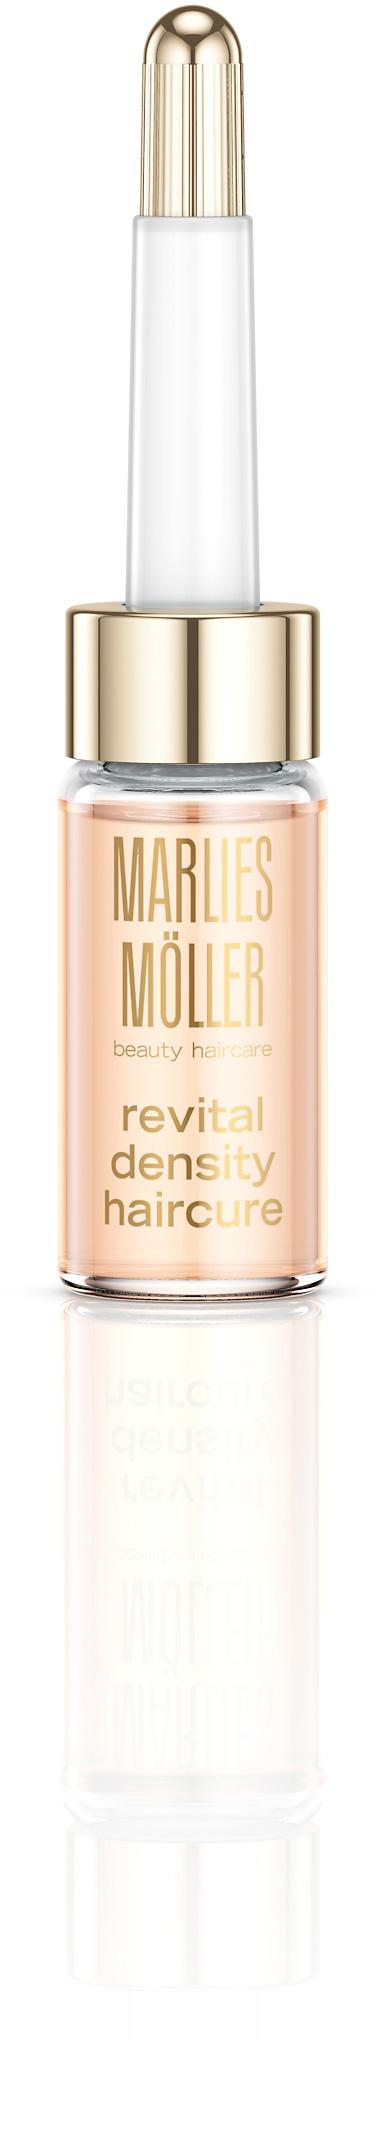 Marlies Möller Special Revit Density Cure 15 x 6 ml